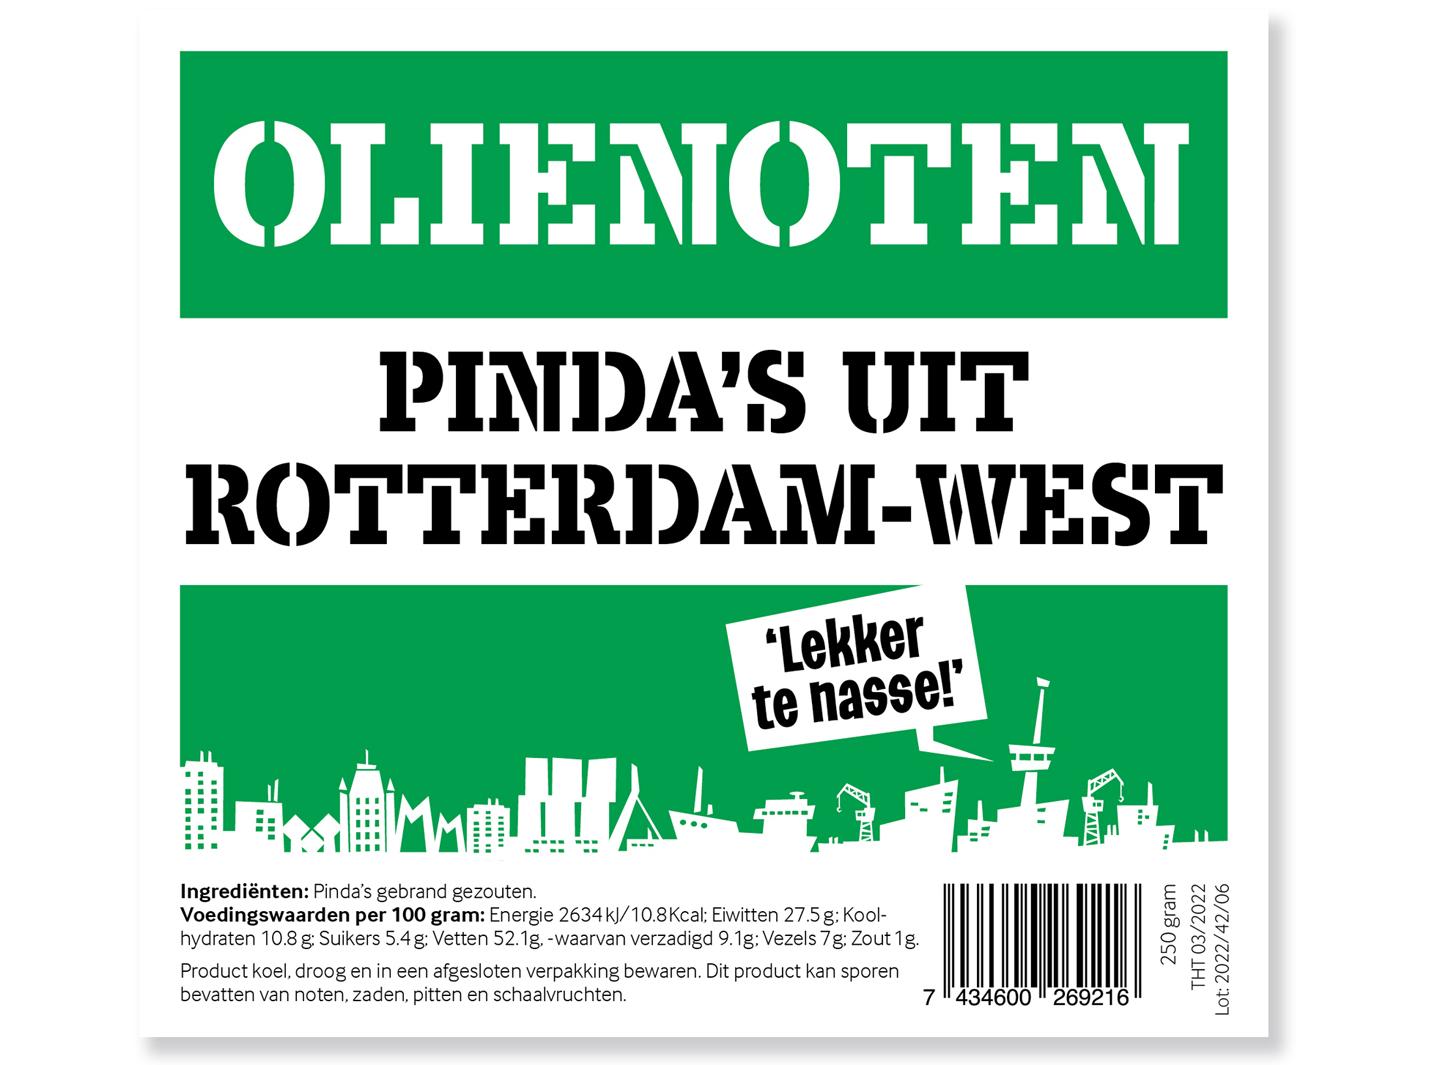 Pinda_Olienoten_label_11x10cm